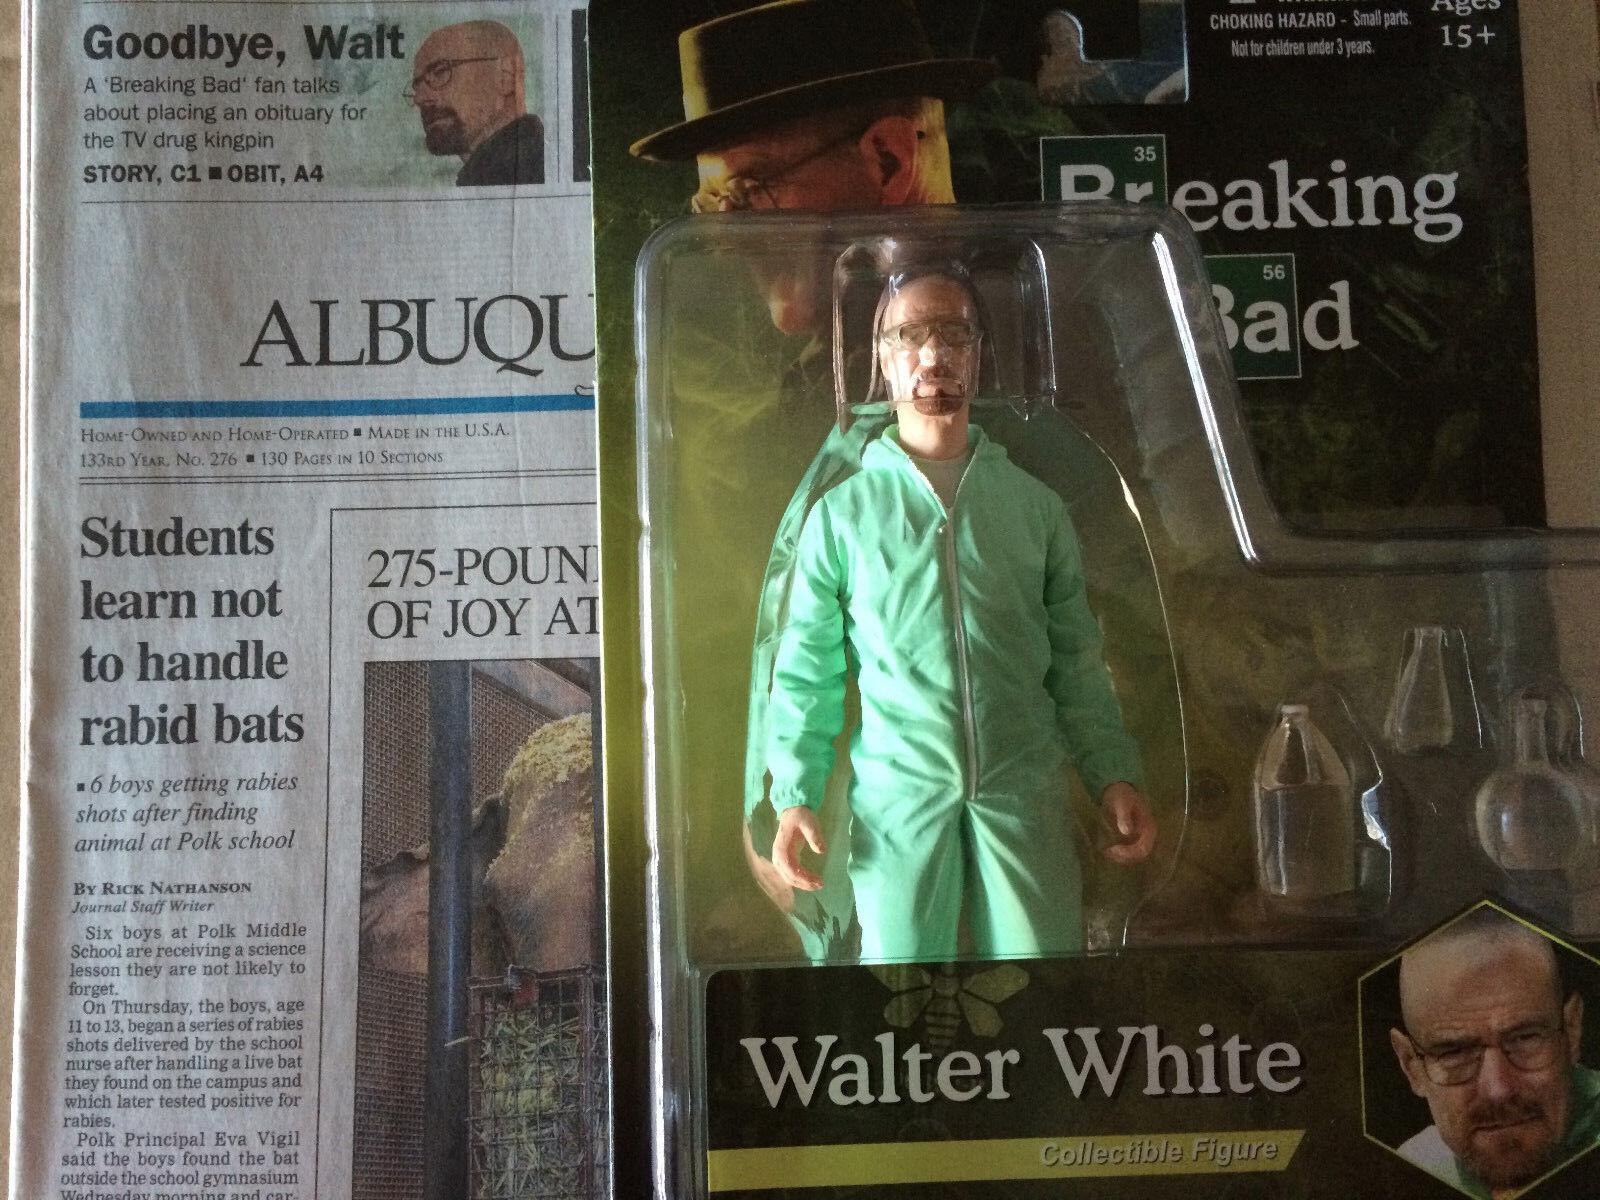 breaking bad  heisenberg mezco bild & walter Weiß nachruf Blaubag alb.